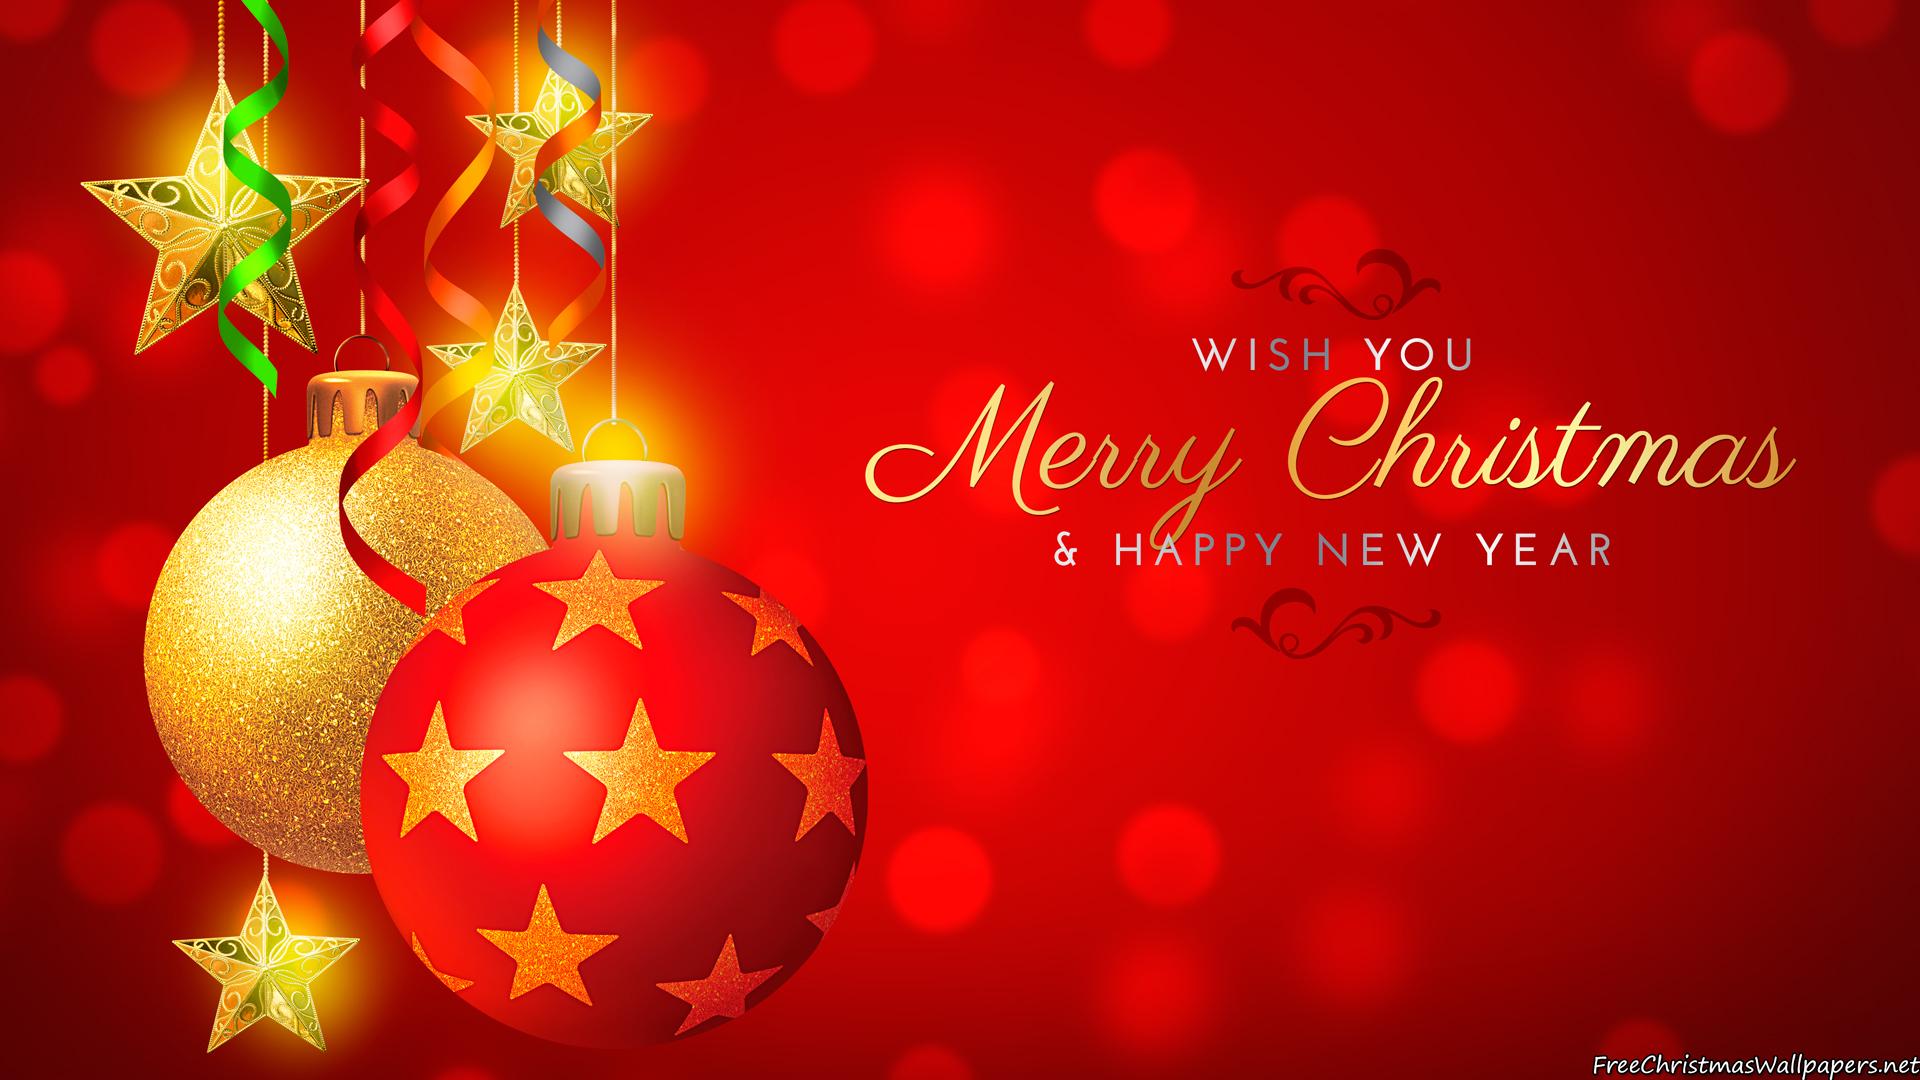 BLESSED CHRISTMAS ON FULL MOON DAY – Bhavanajagat